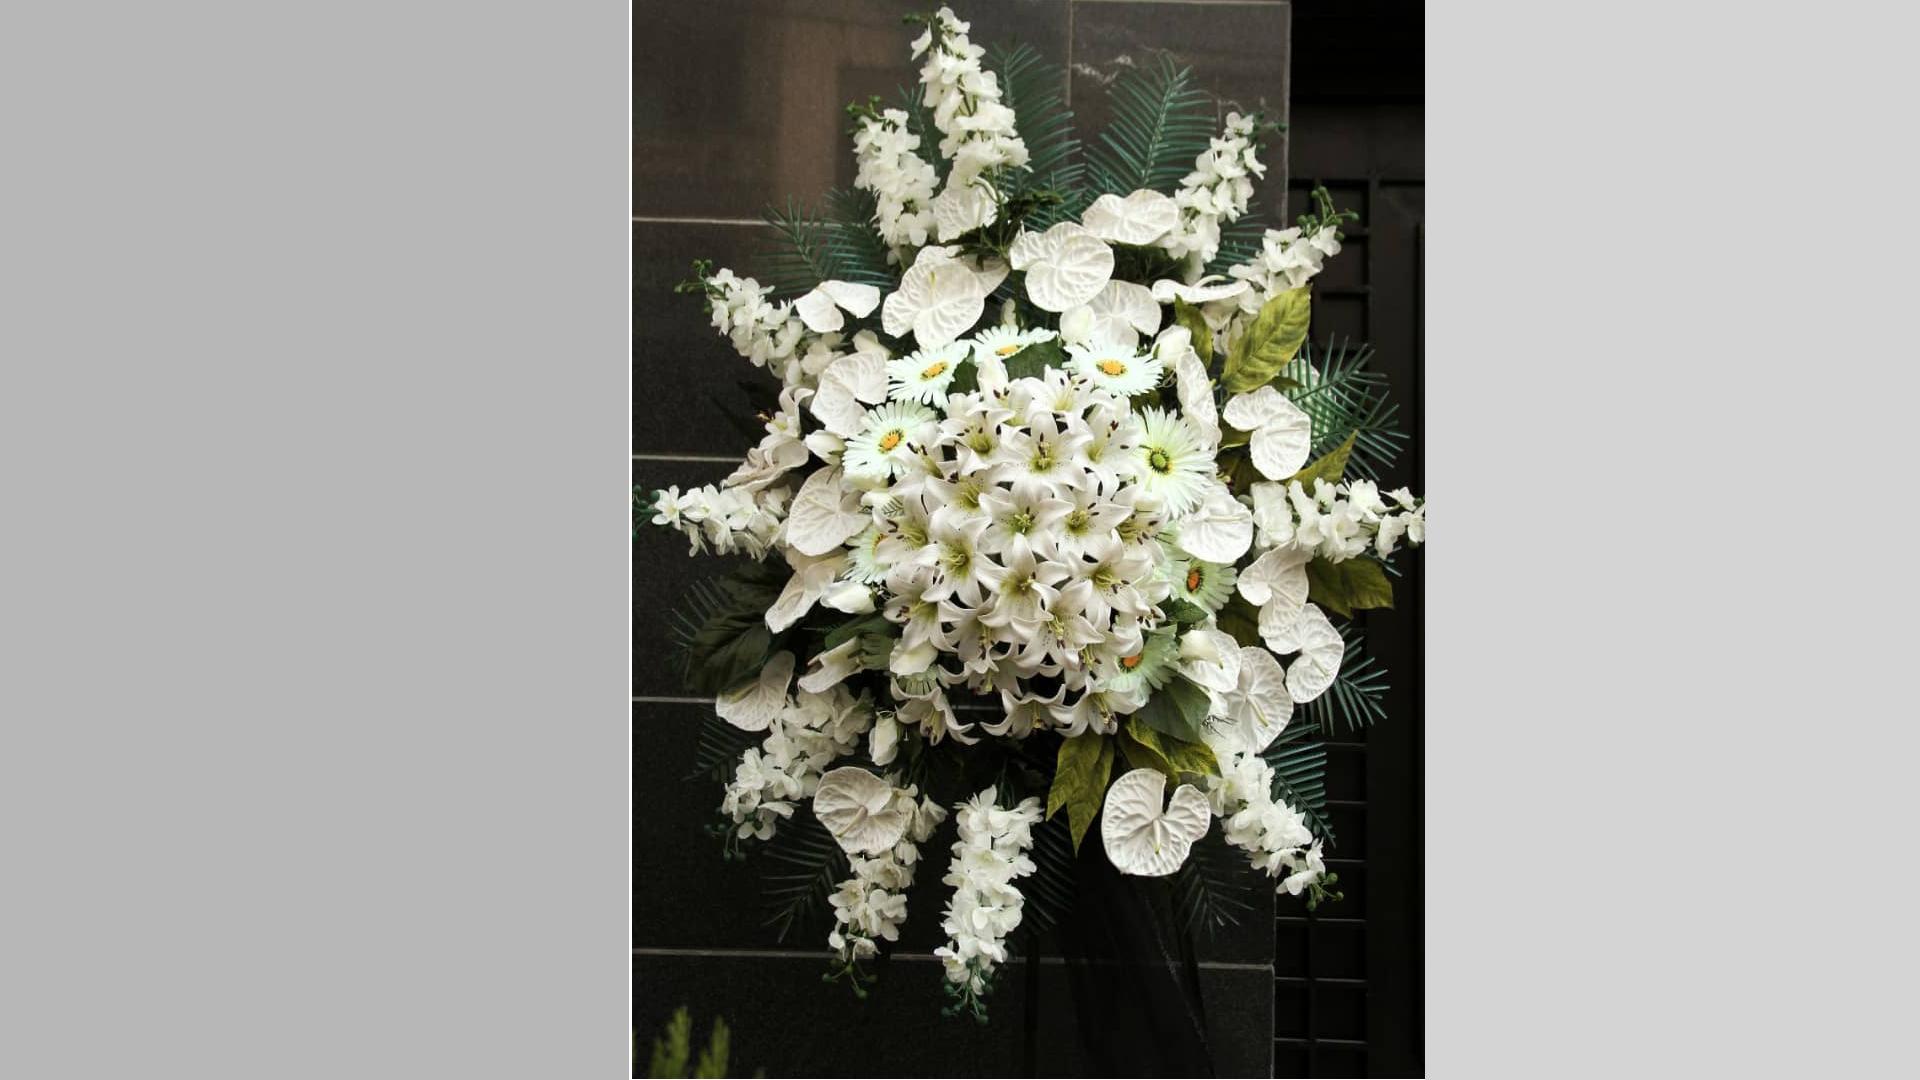 سفارش تاج گل مصنوعی